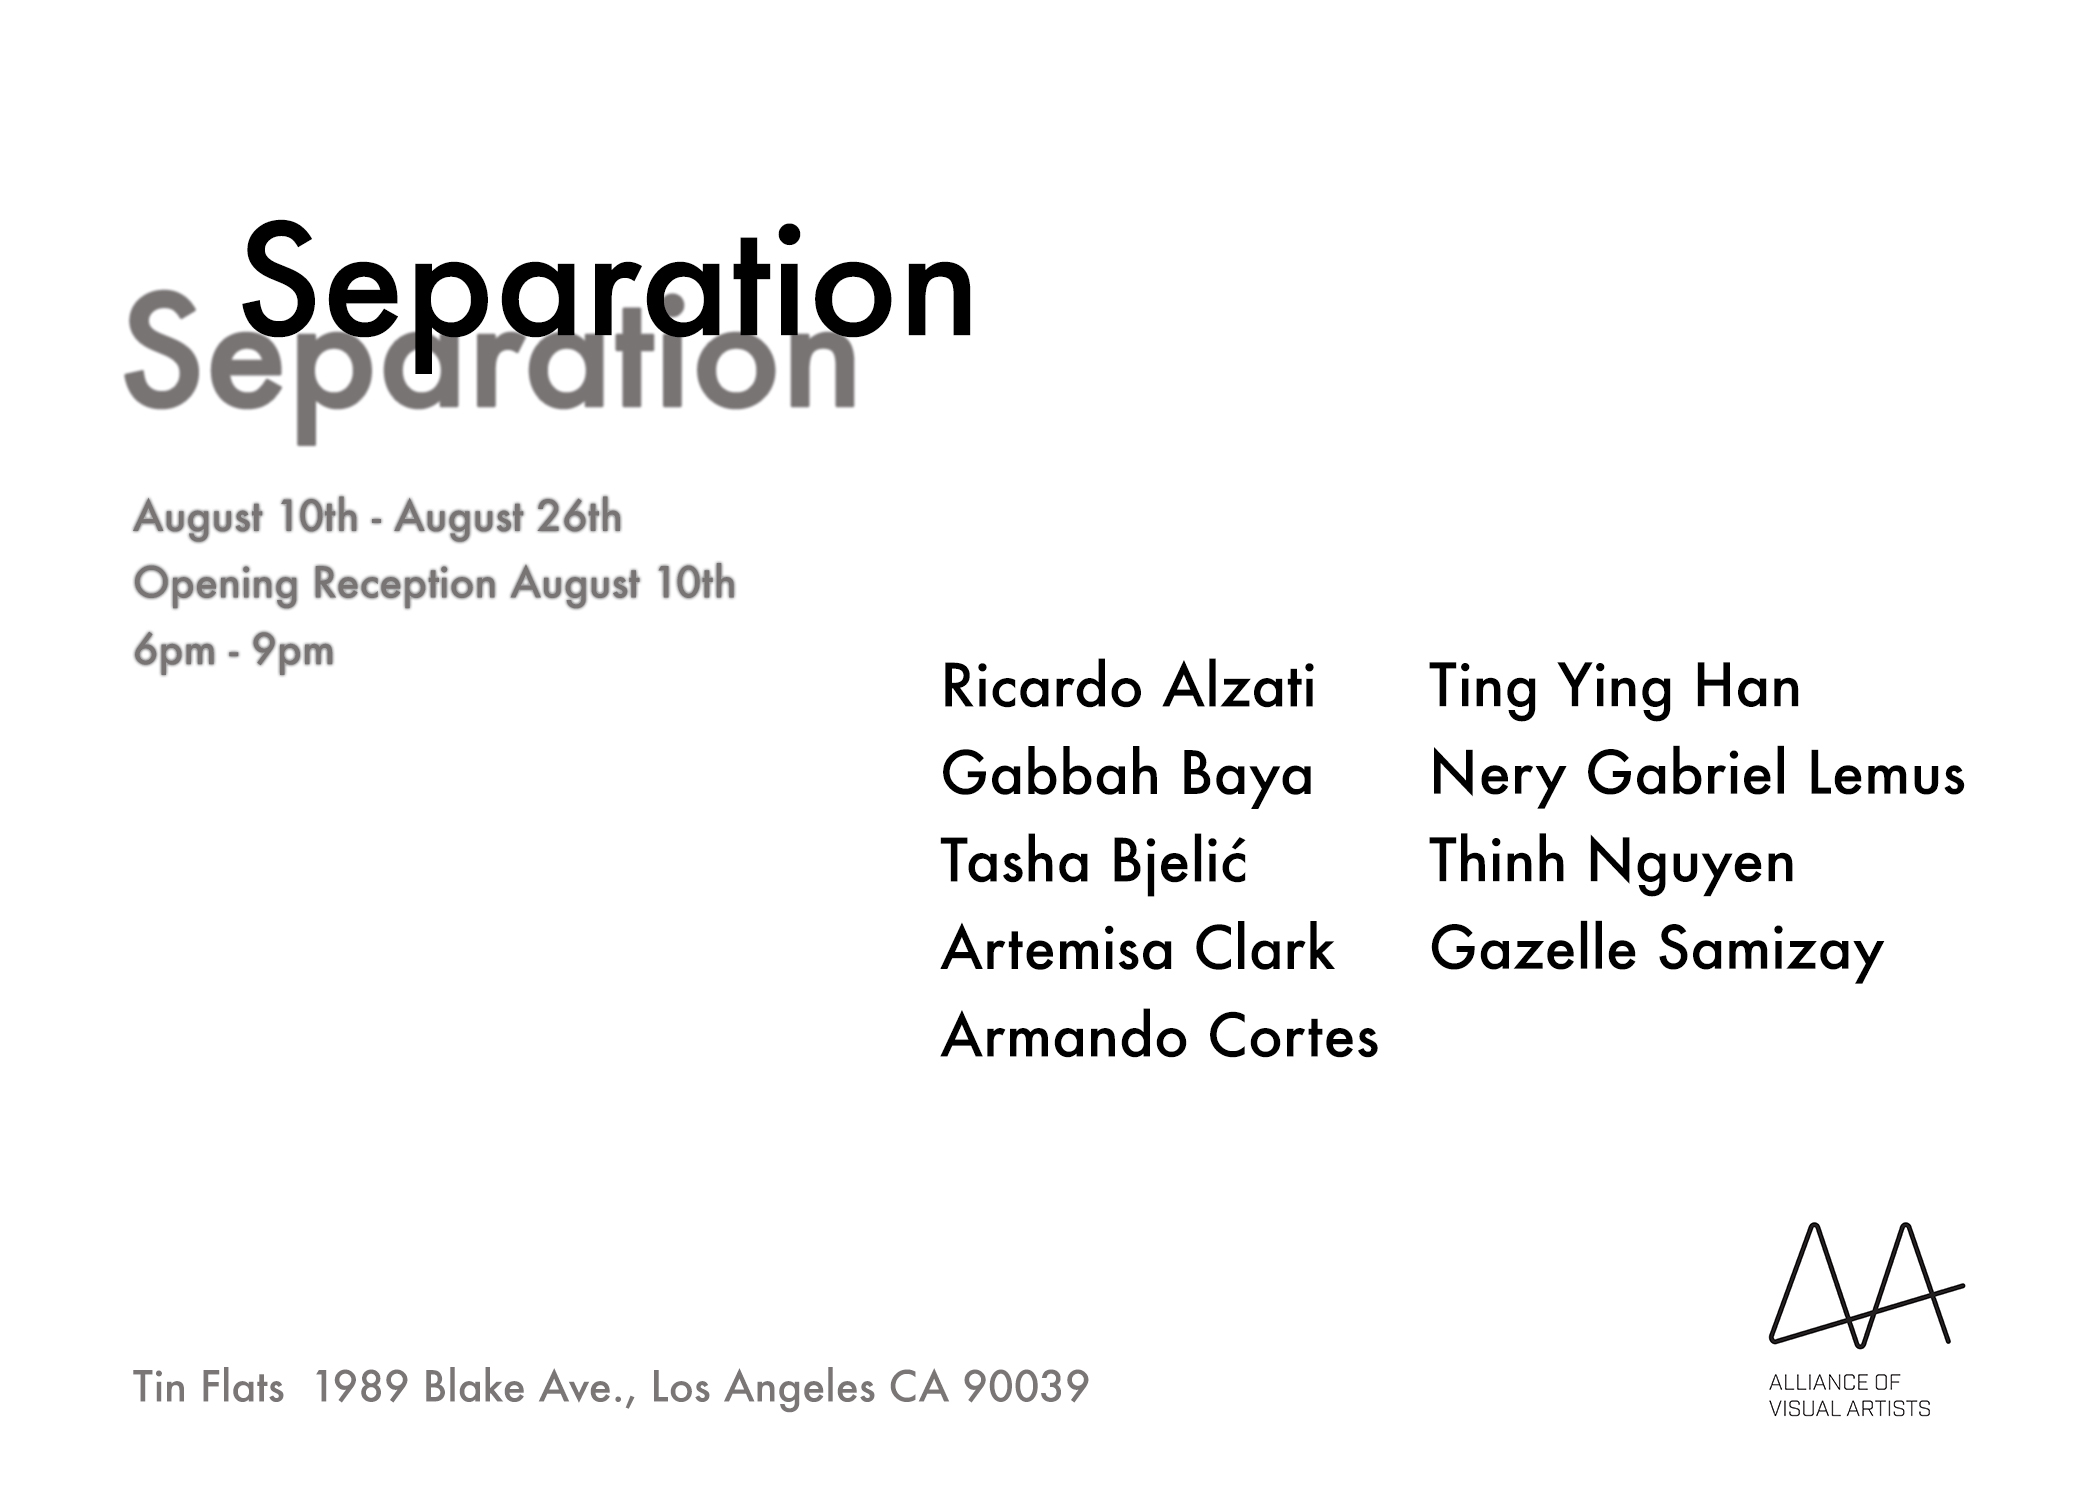 Separation PR Image (1).jpg